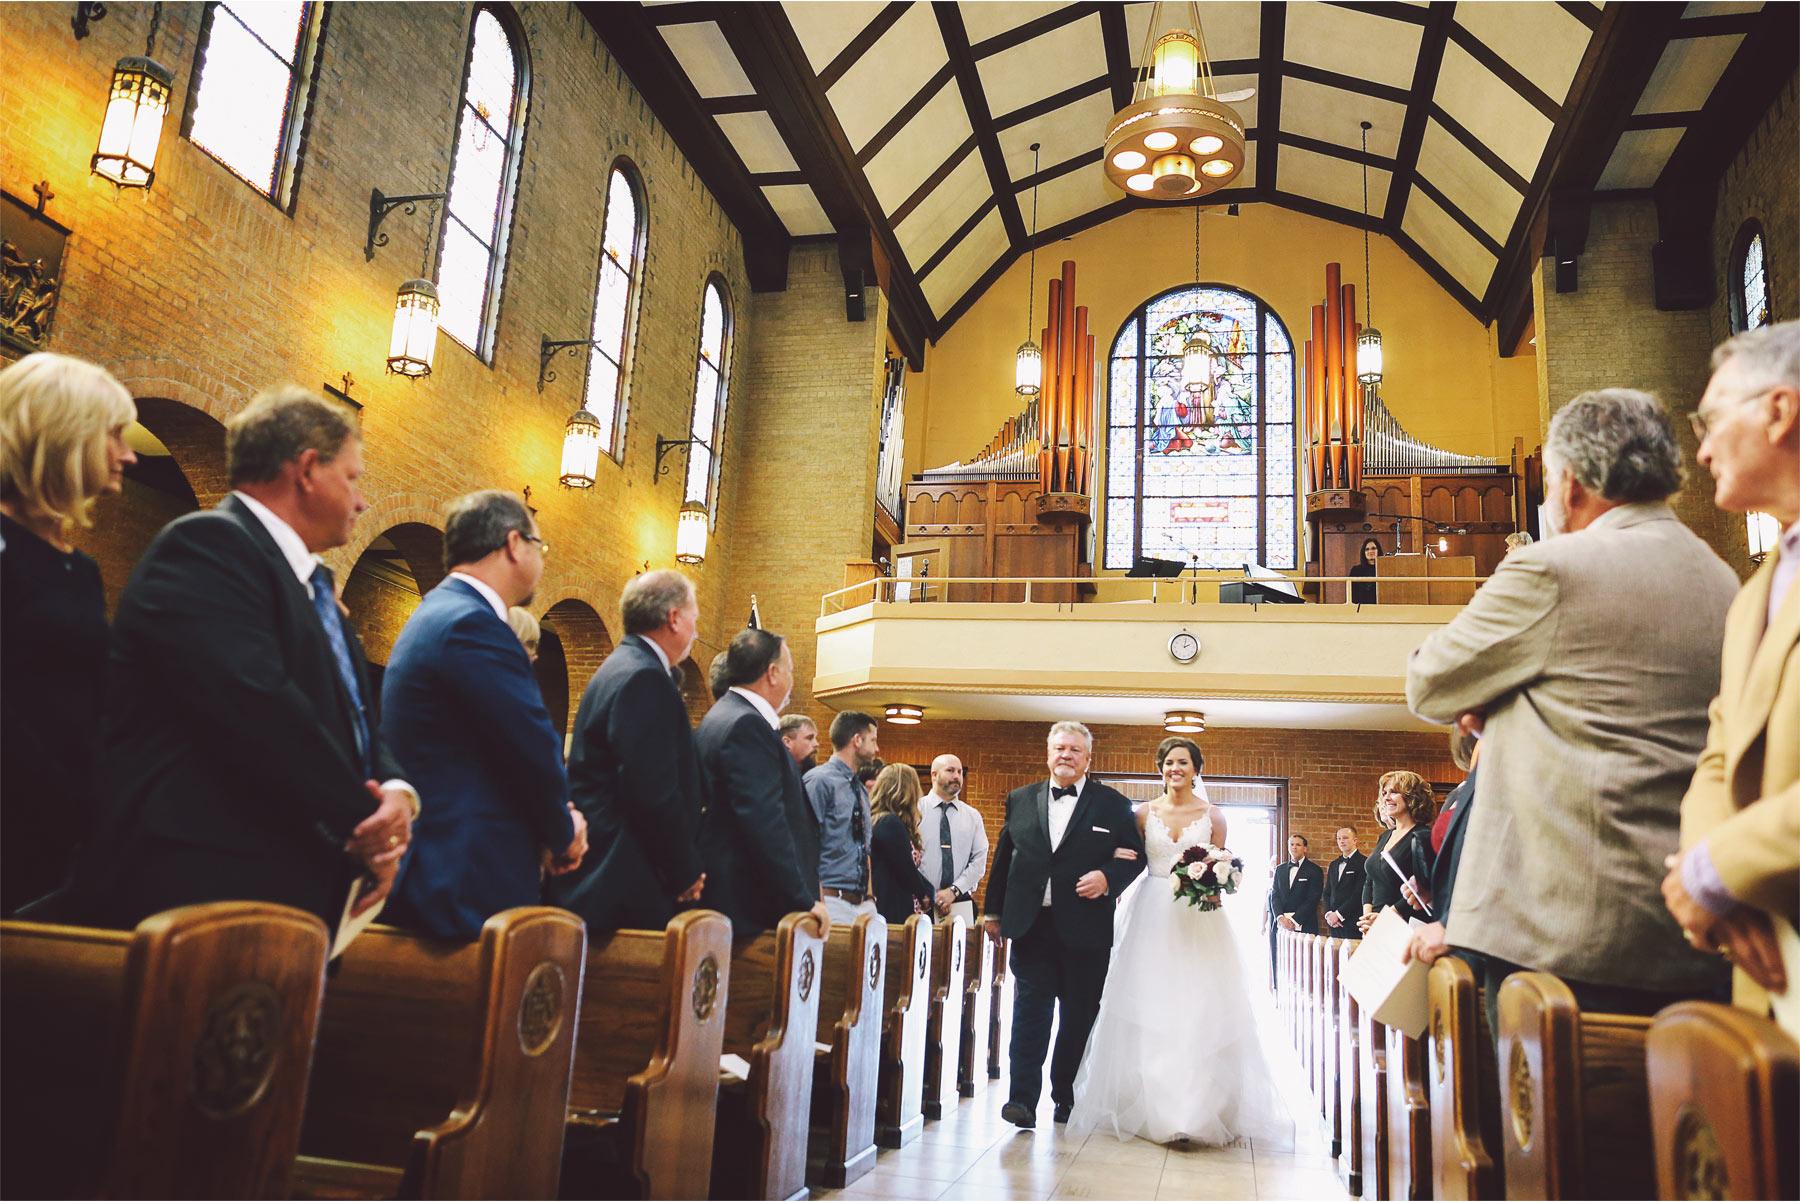 11-Brainerd-Minnesota-Wedding-Photography-by-Vick-Photography-St.-Francis-Catholic-Church-Ceremony-Bethany-and-Anthony.jpg